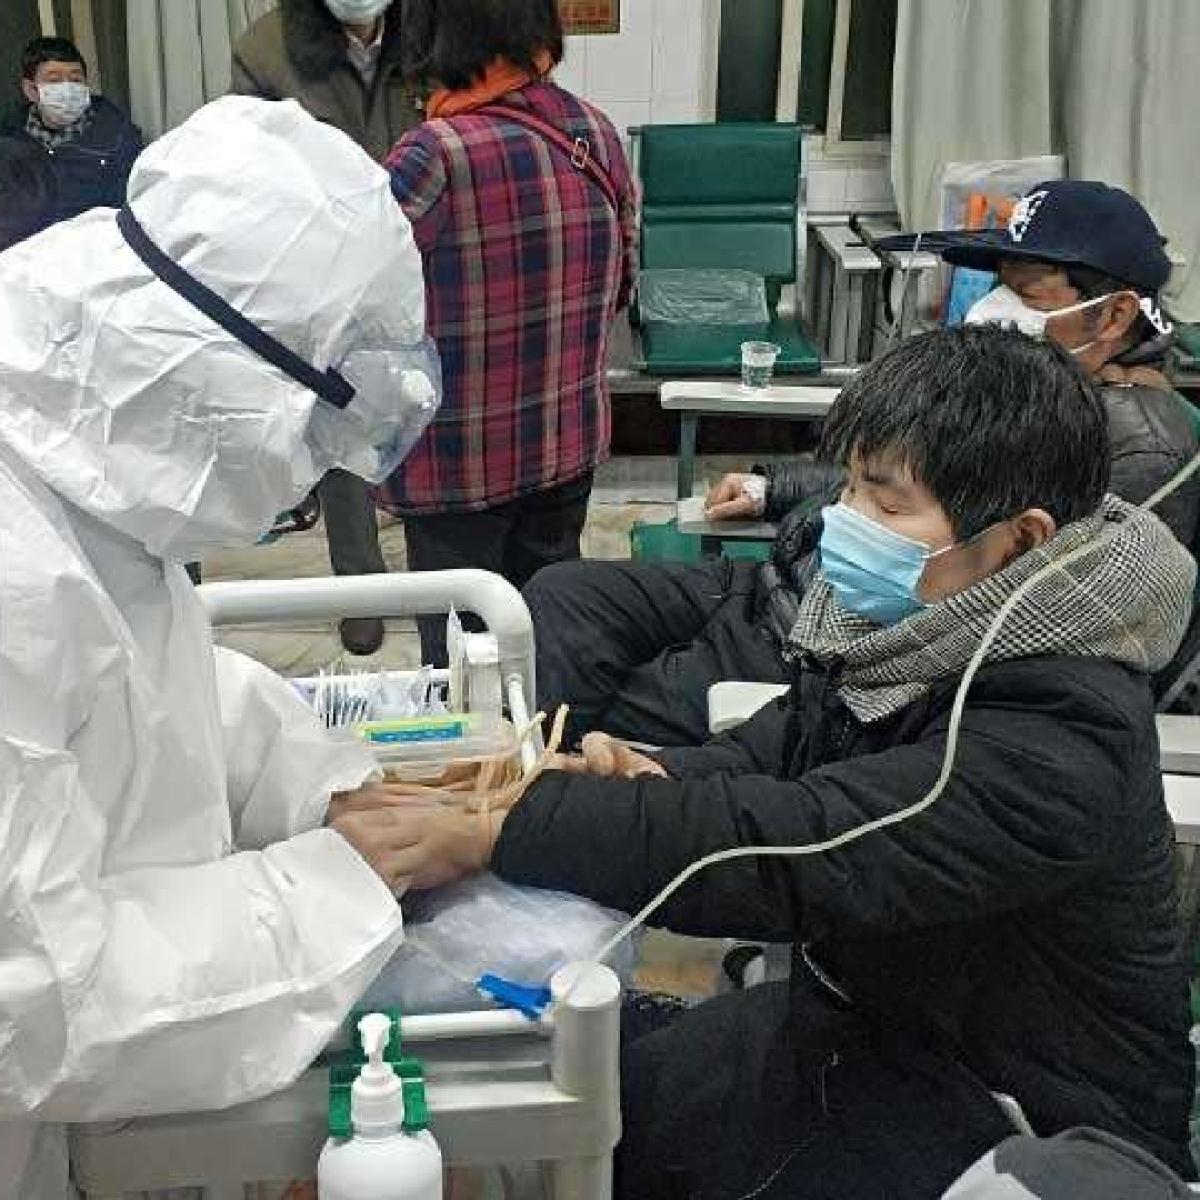 Tokyo Olympics 2020 stumbles as coronavirus panic grips sports world